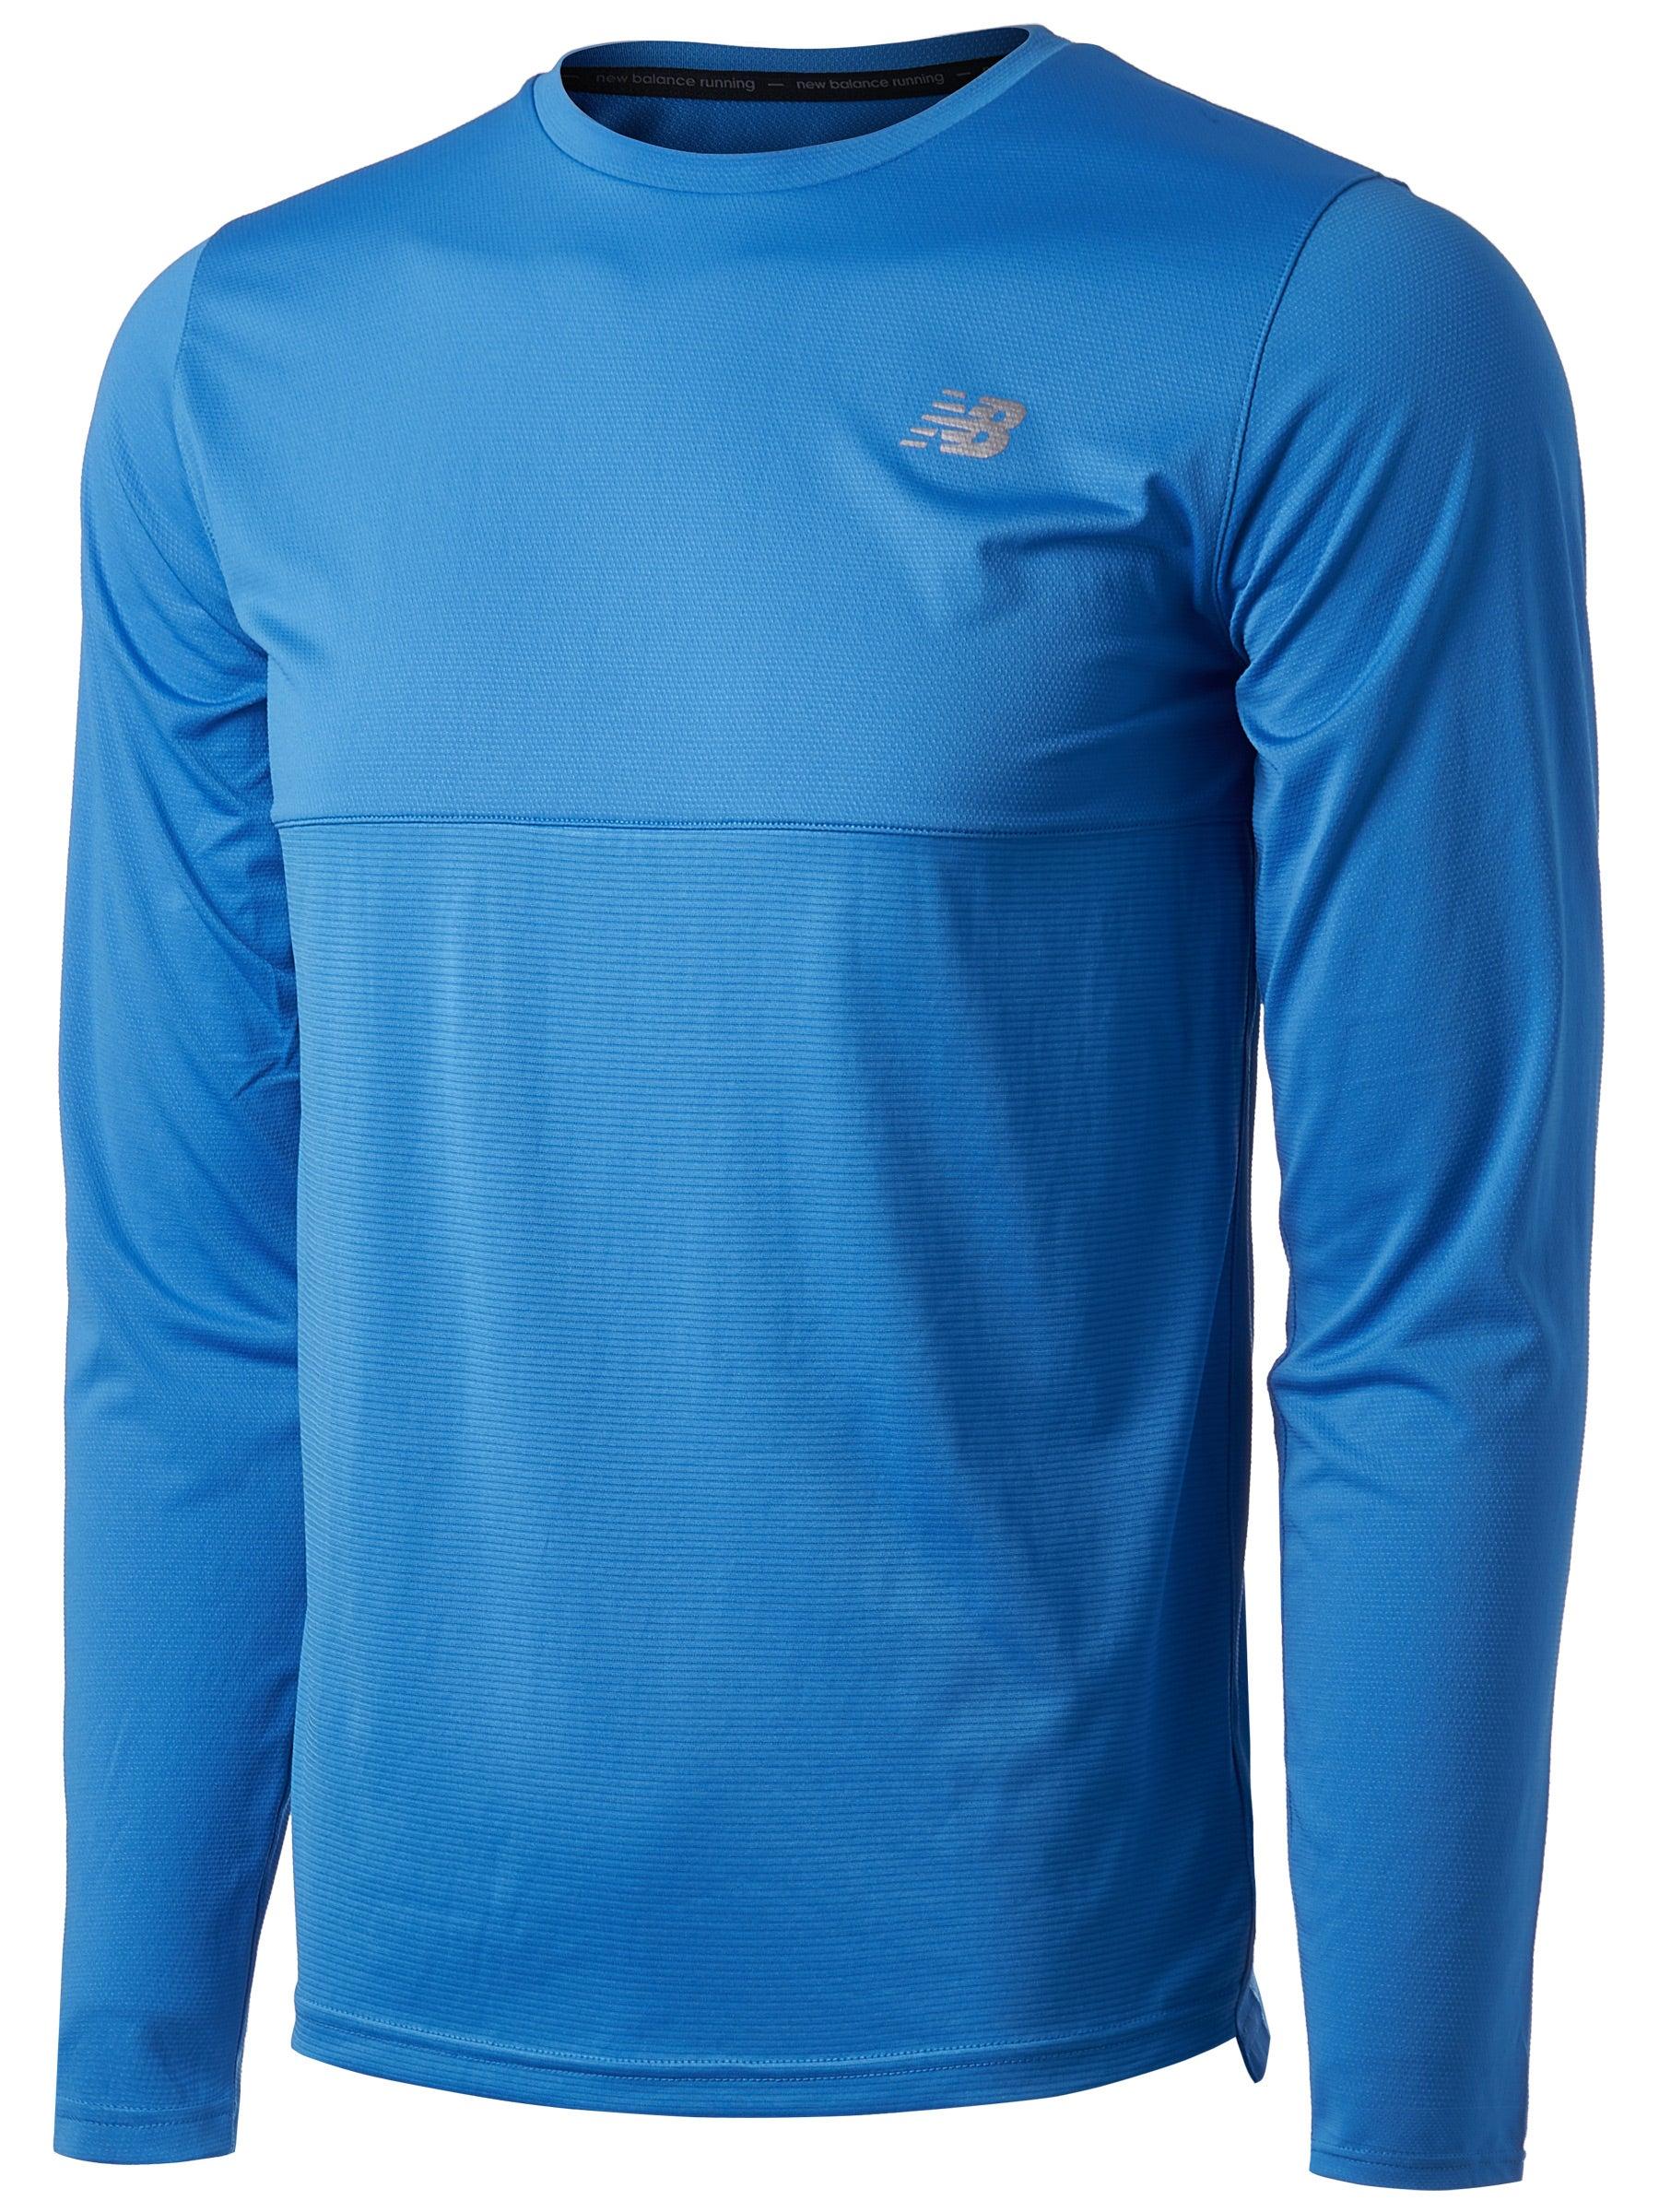 New Balance Mens Seasonless Breathable Lightweight Short Sleeve Running T-Shirt